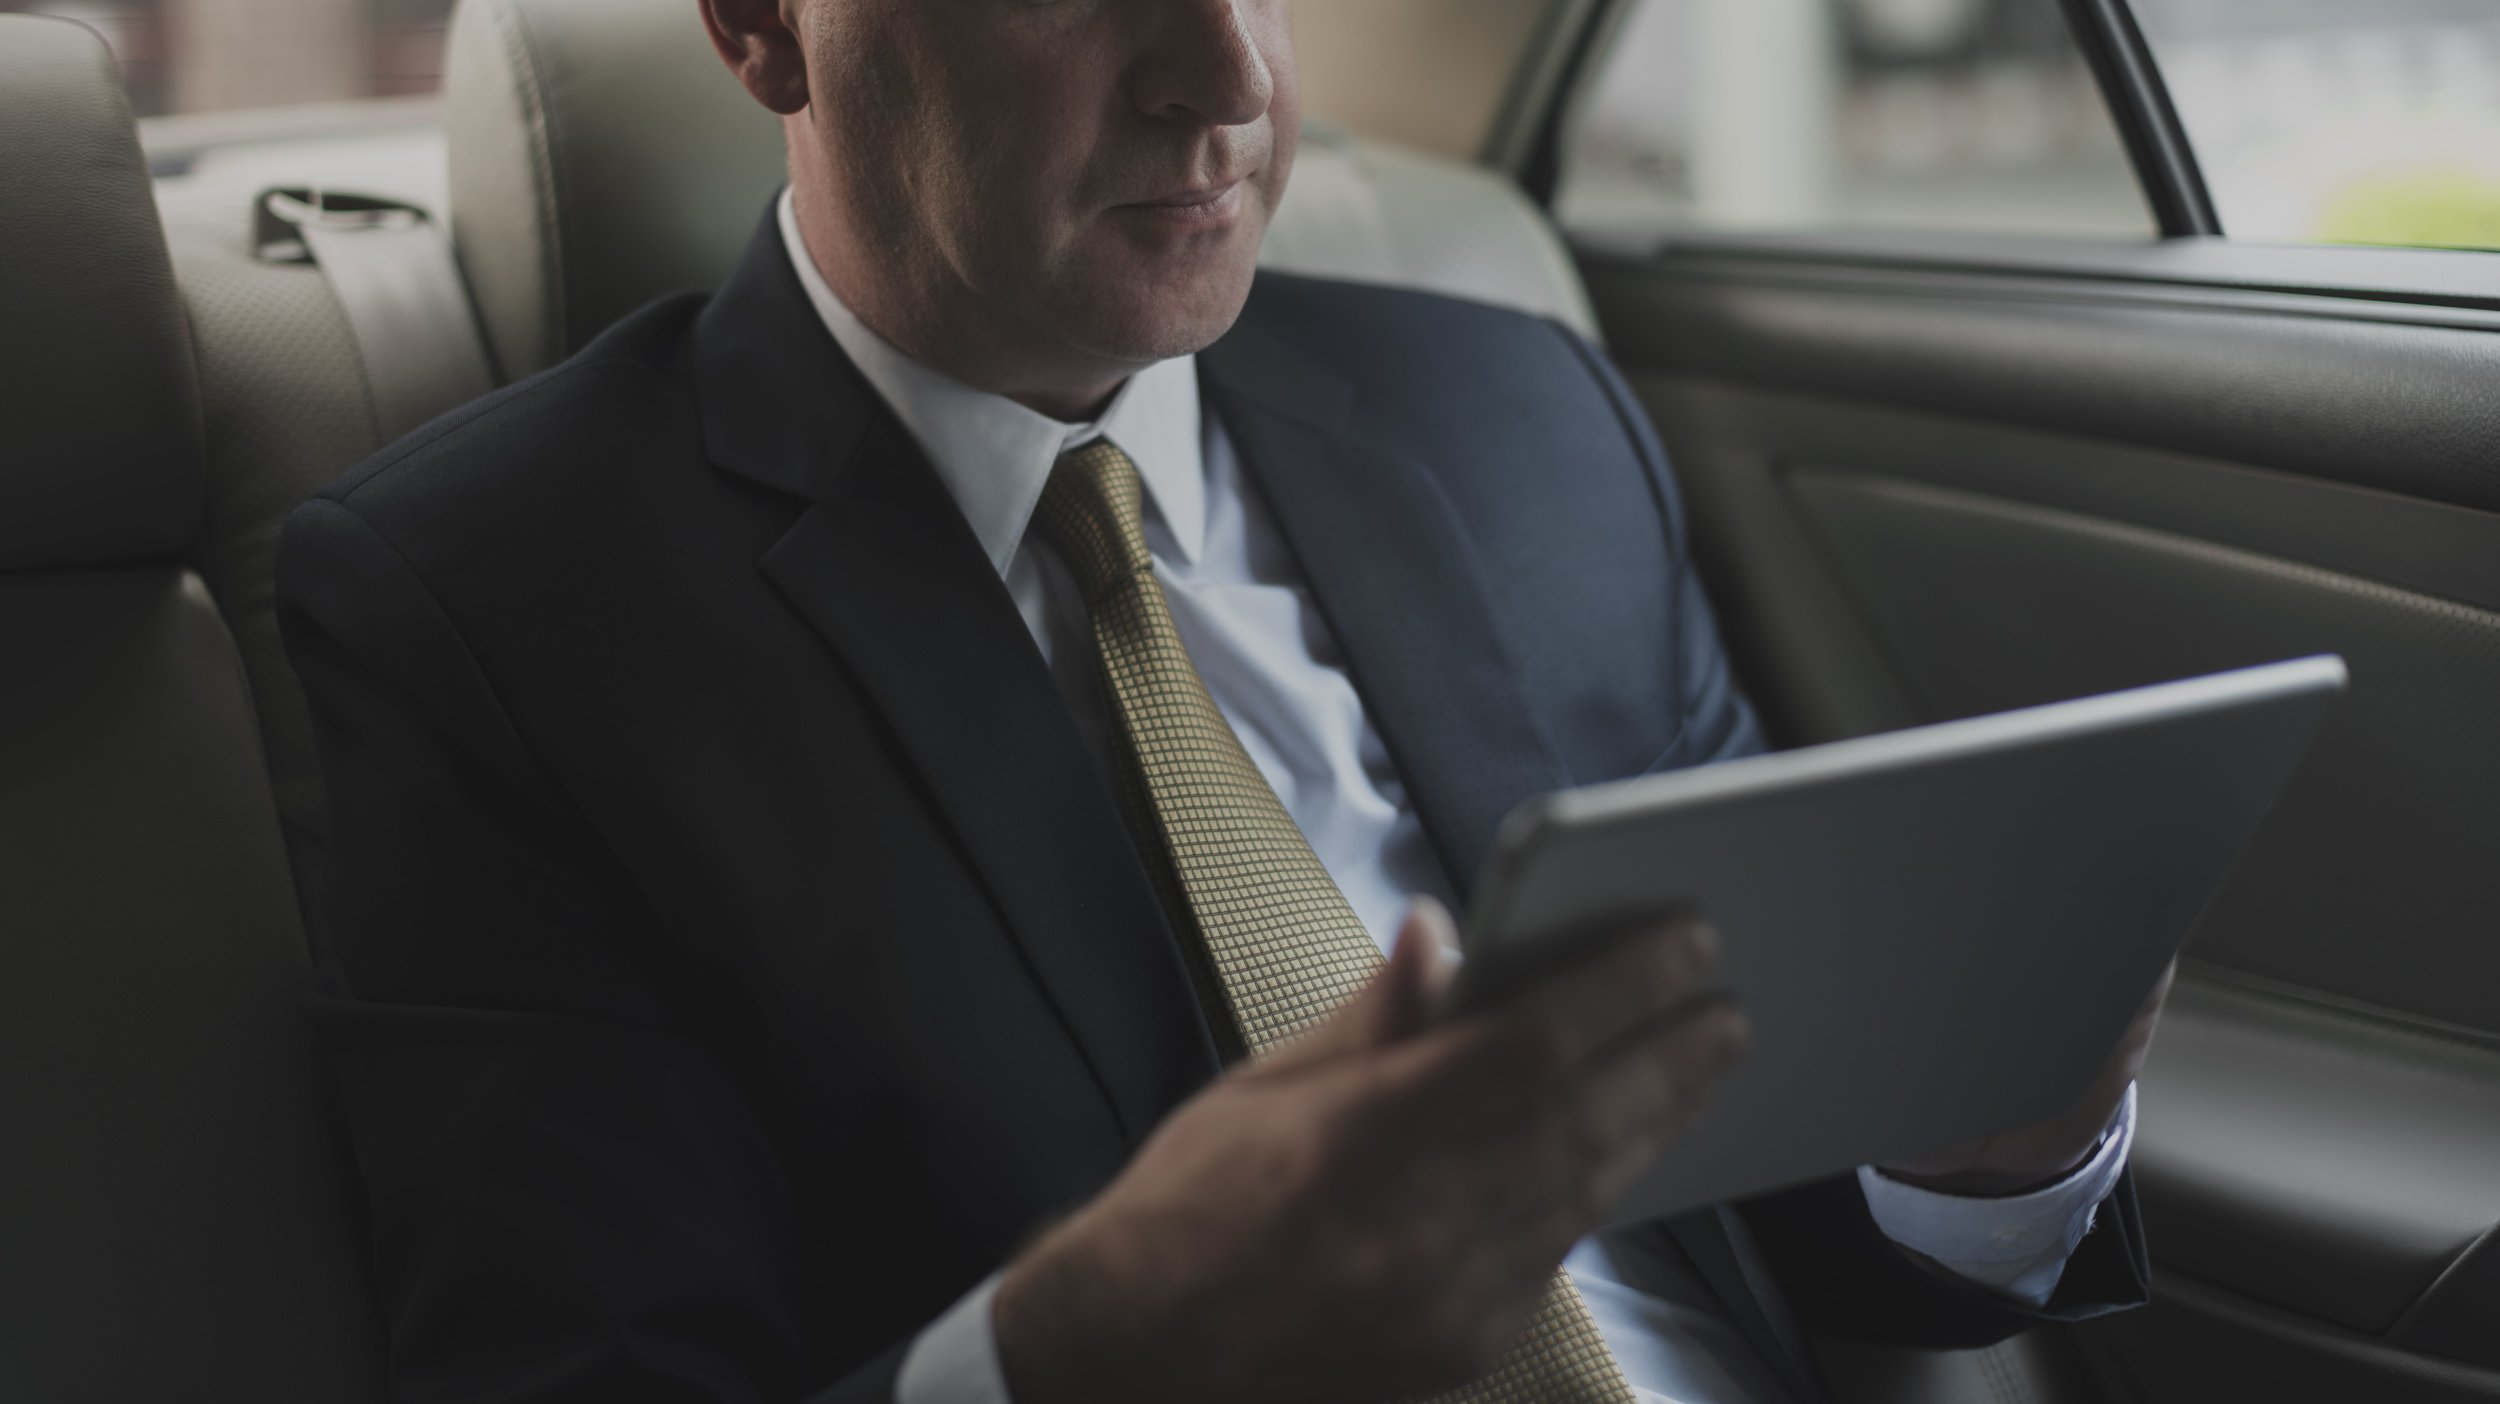 stamford-limo-service-example-of-executive-saving-time-min.jpg